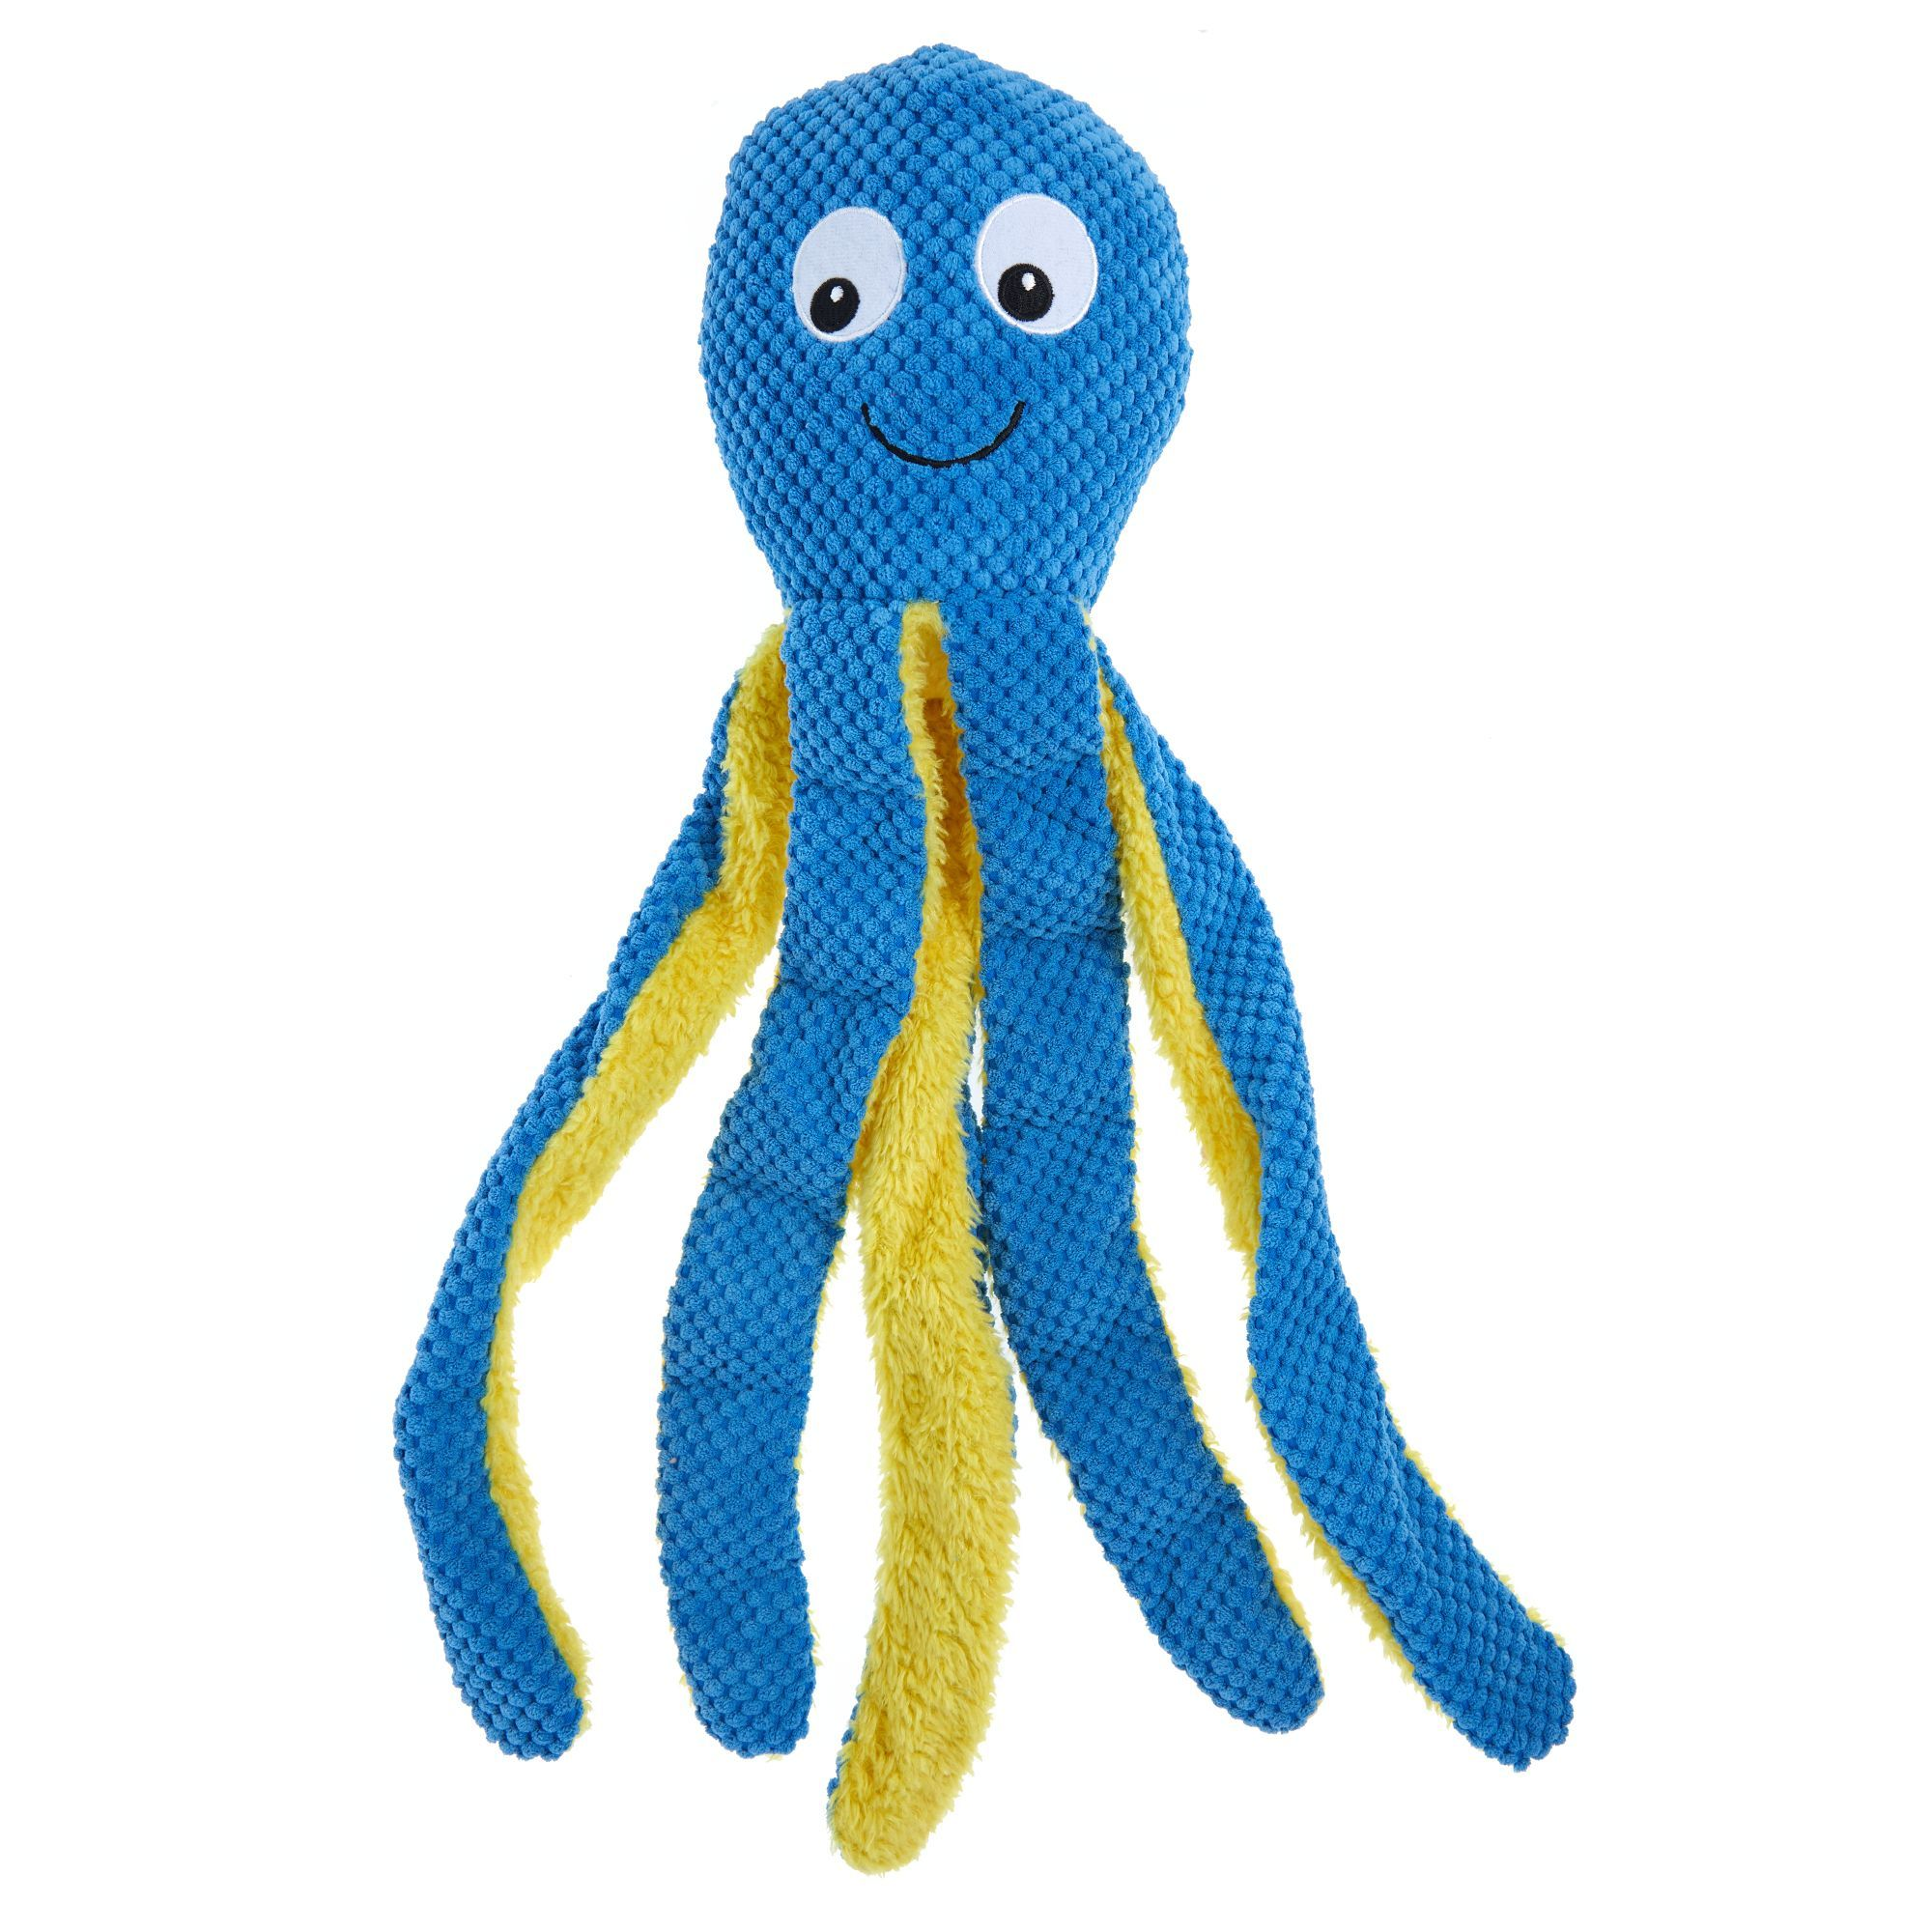 Top Paw Octopus Dog Toy Plush Squeaker Black Blue White Toy